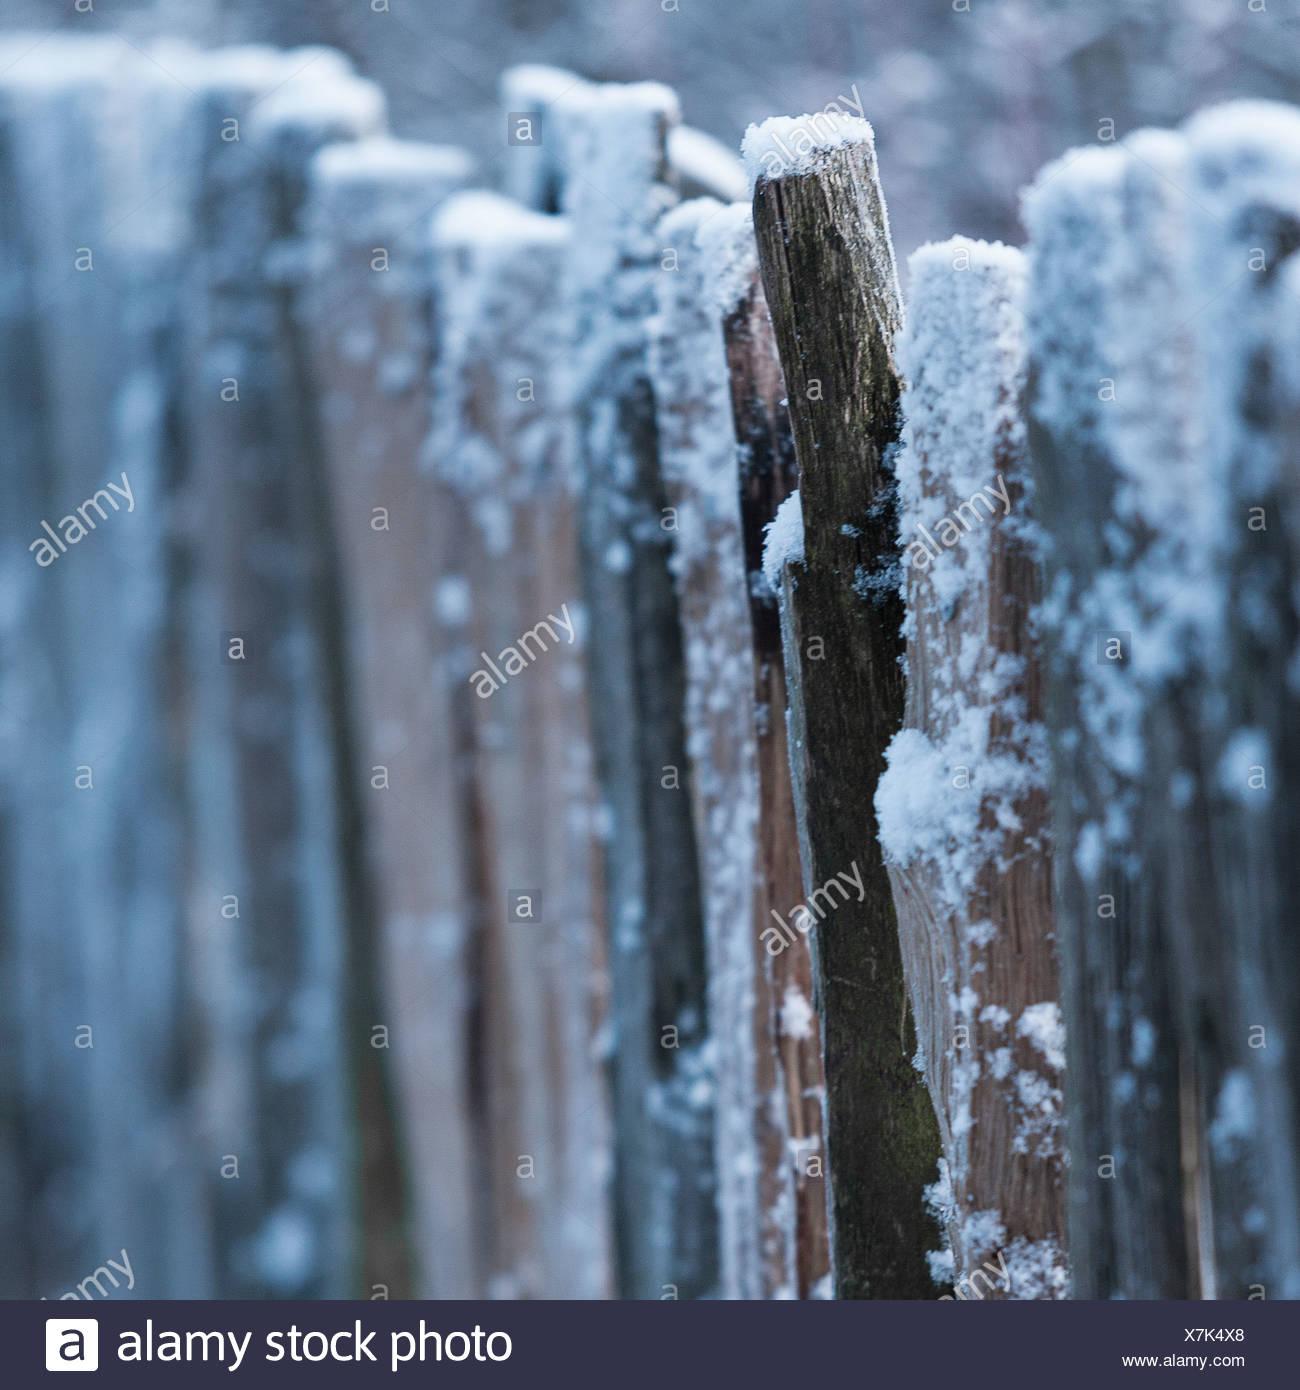 Barrière en bois recouvert de neige Photo Stock